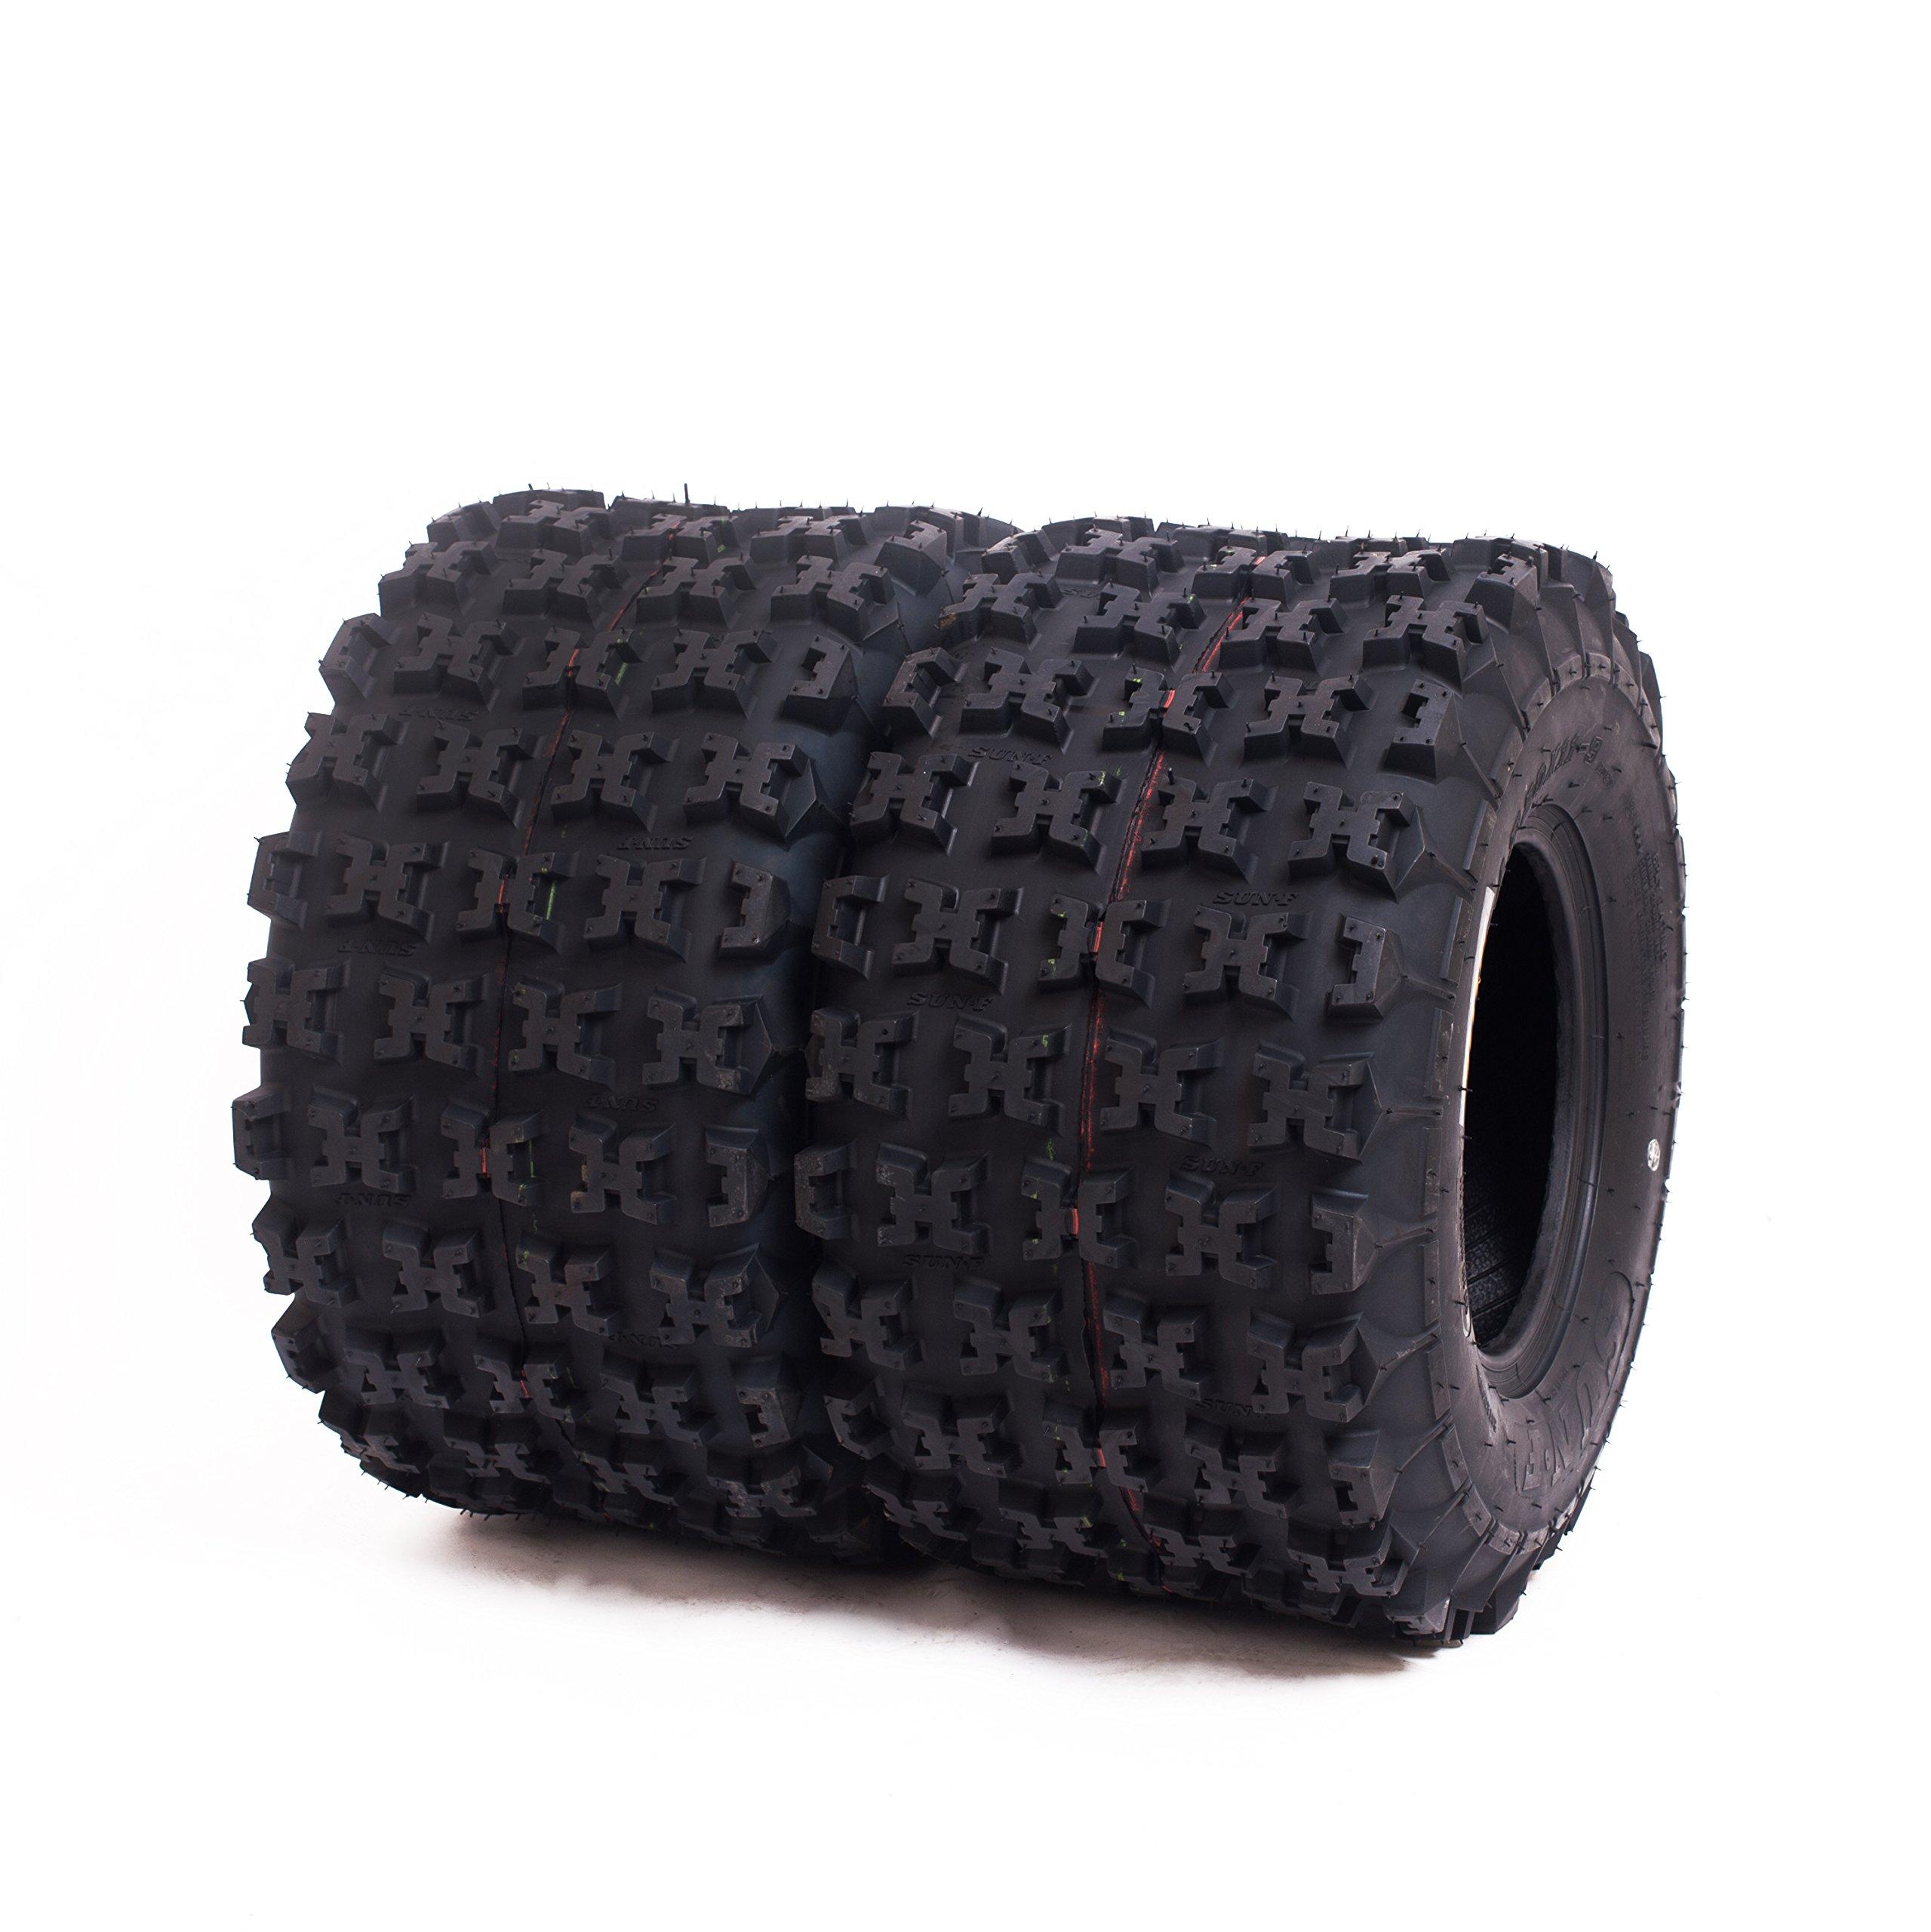 Set of 2 SunF A027 ATV Tire 20x11-9 Rear, 6 Ply